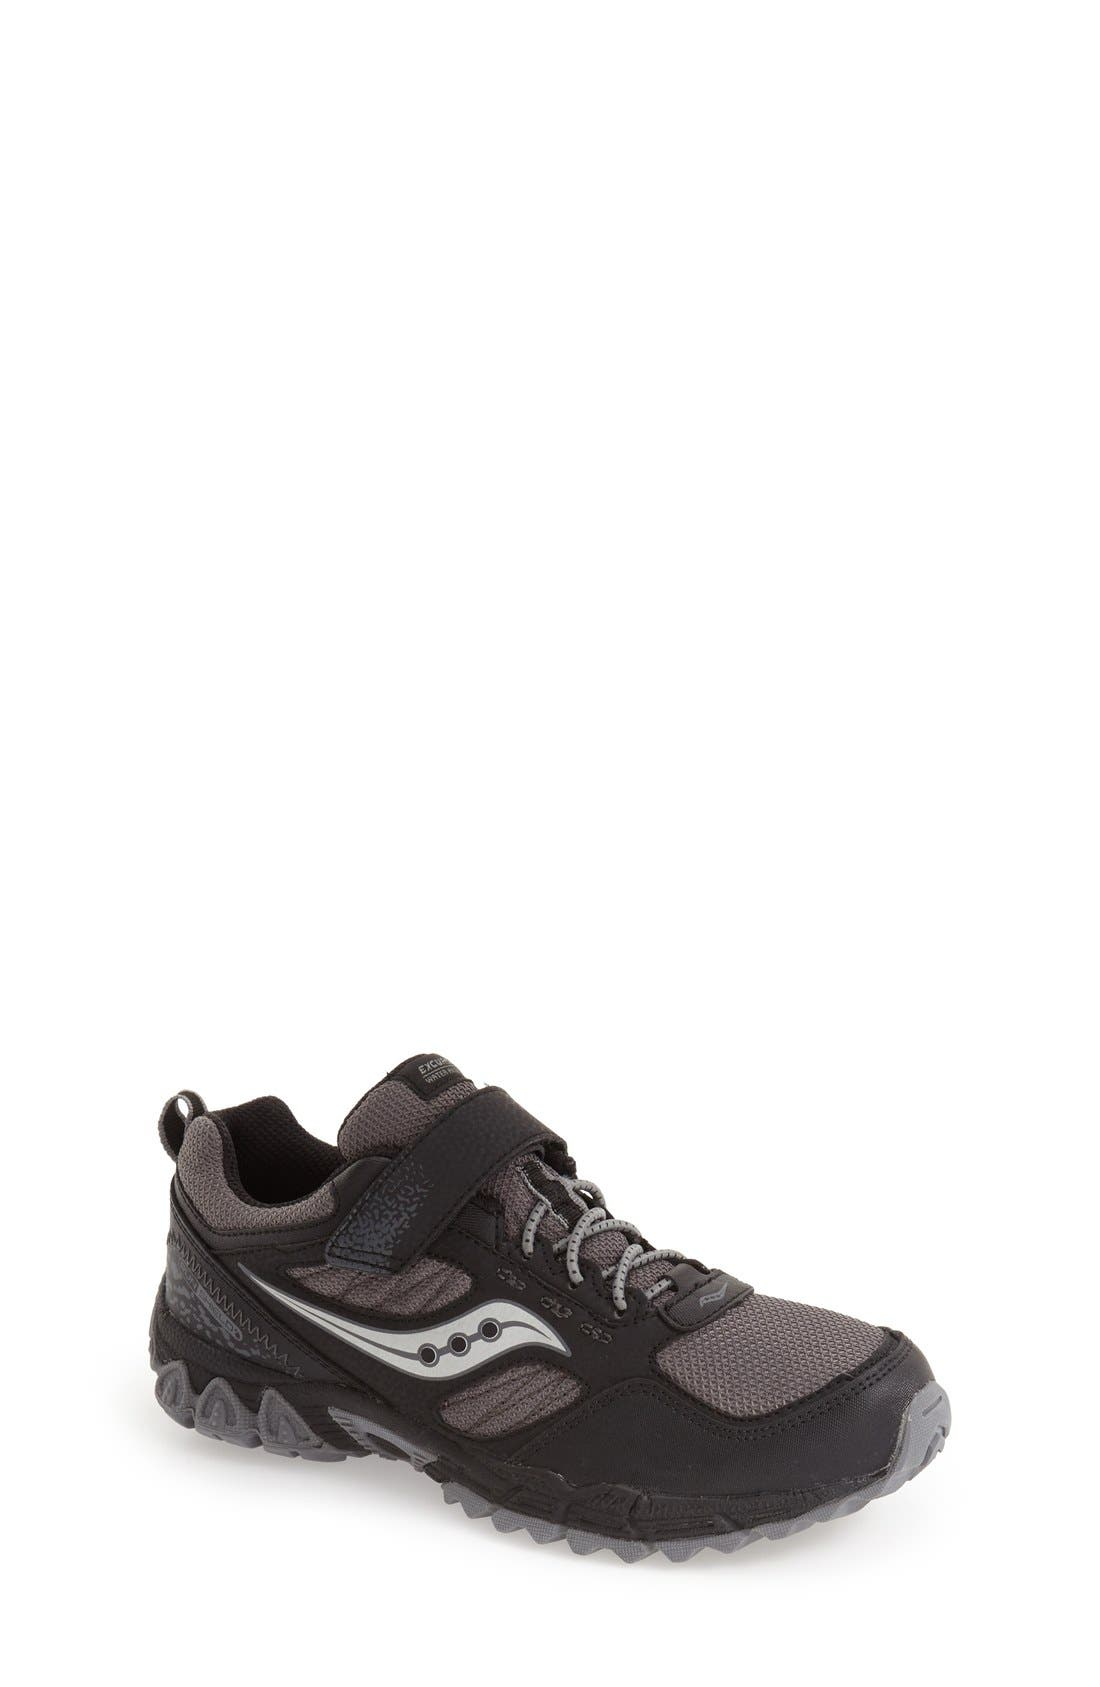 'Excursion Shield' Water Resistant Trail Shoe,                             Main thumbnail 1, color,                             001